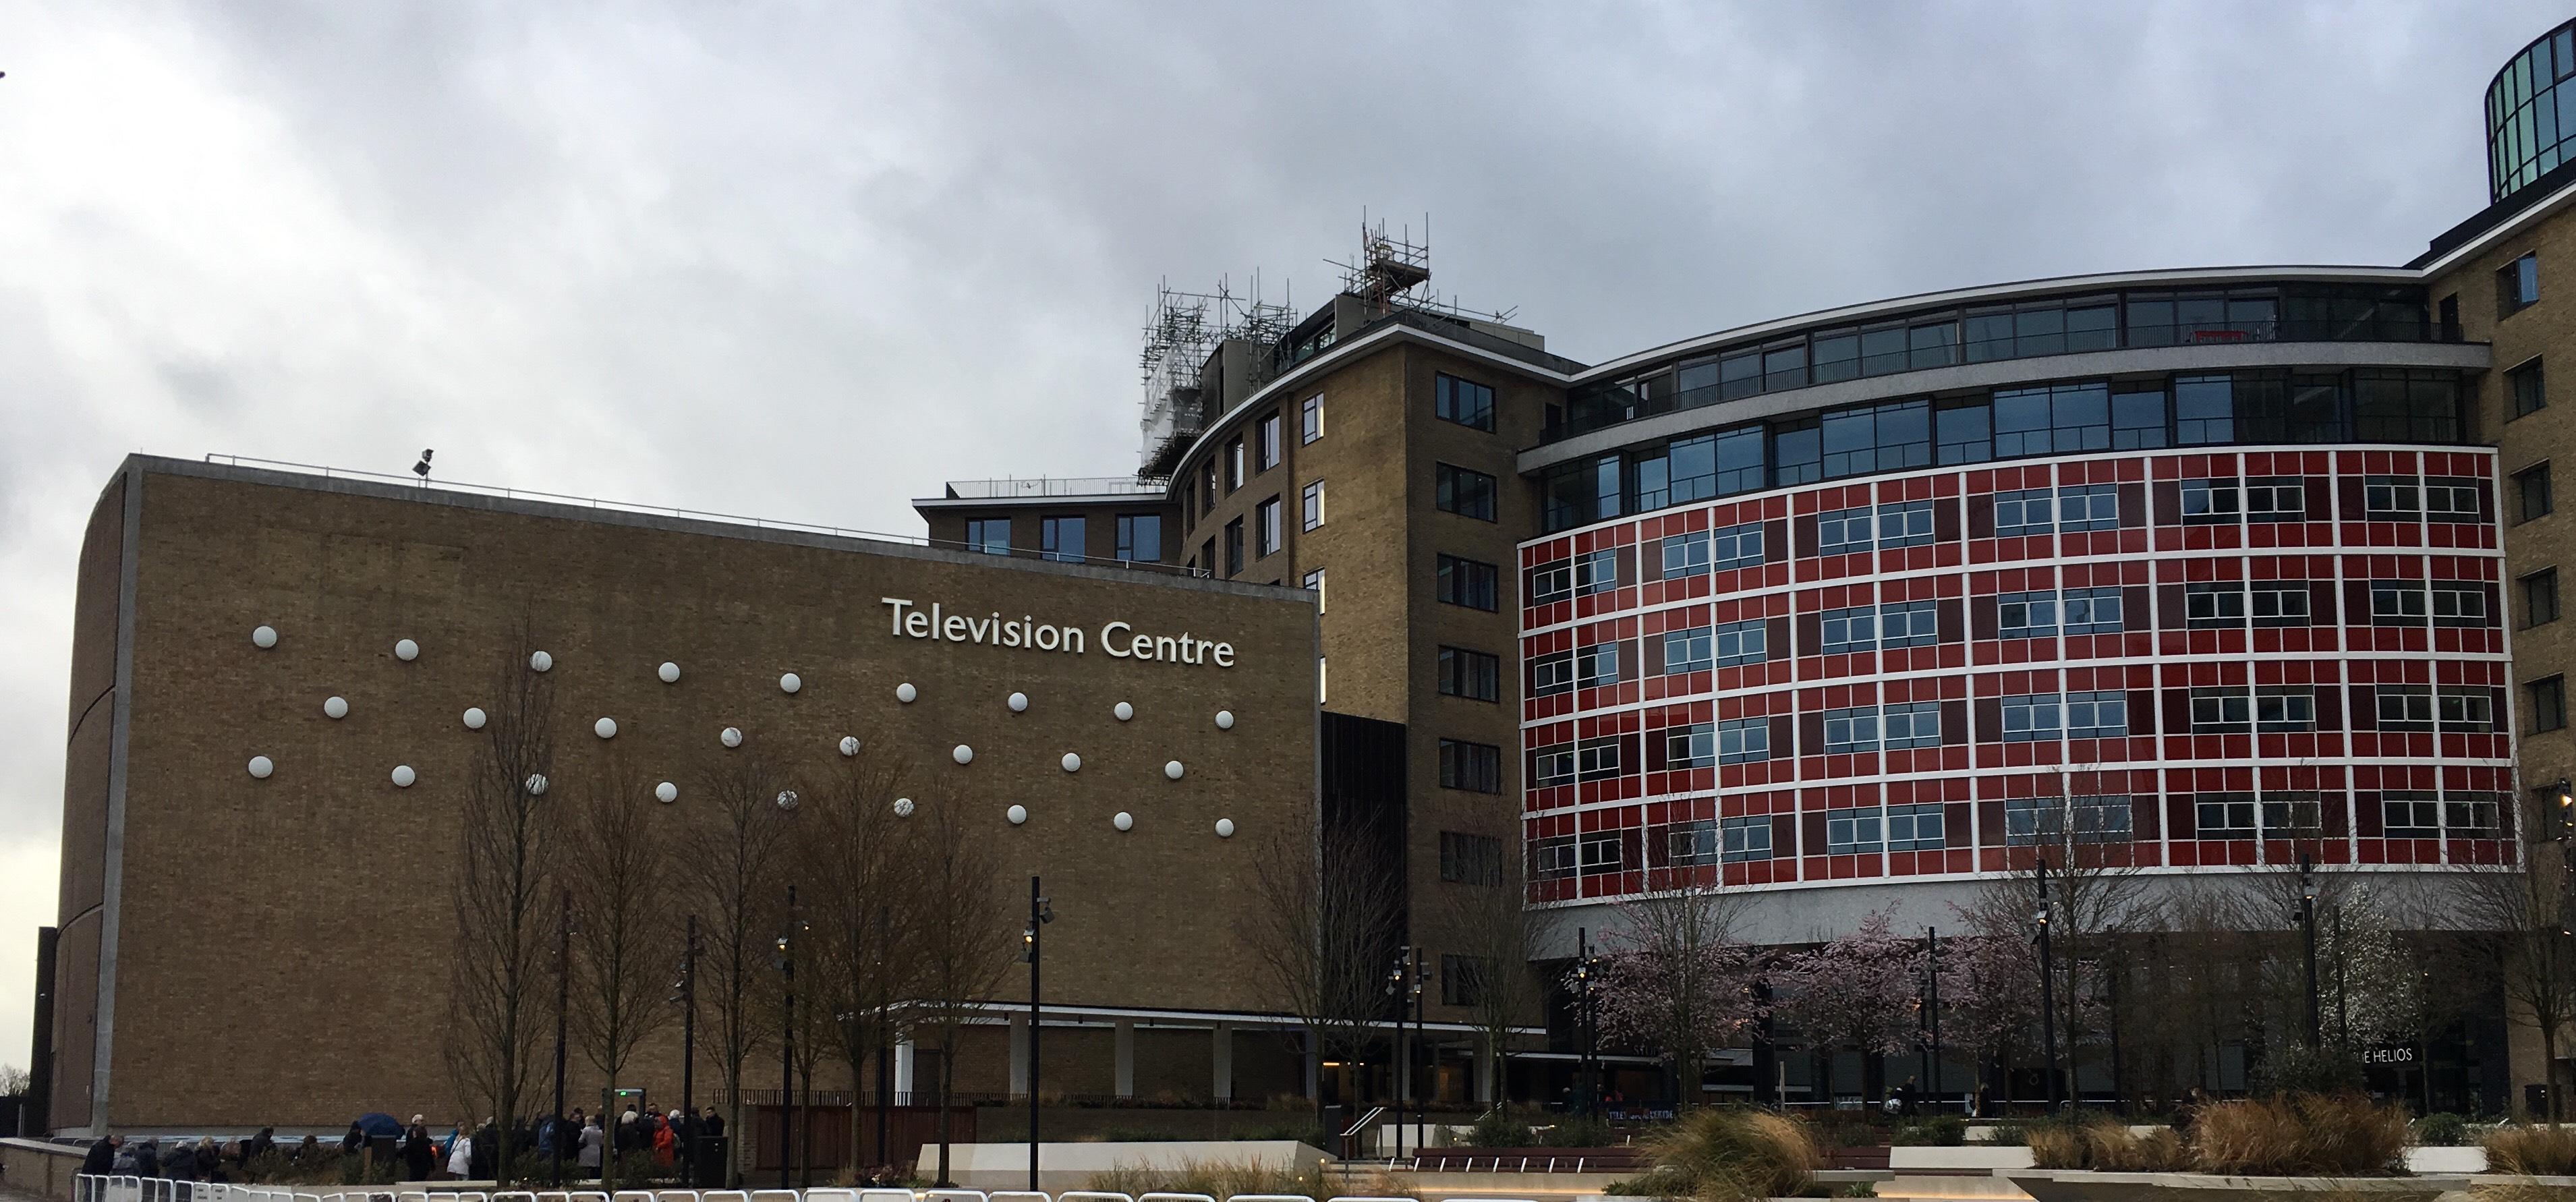 Television Centre